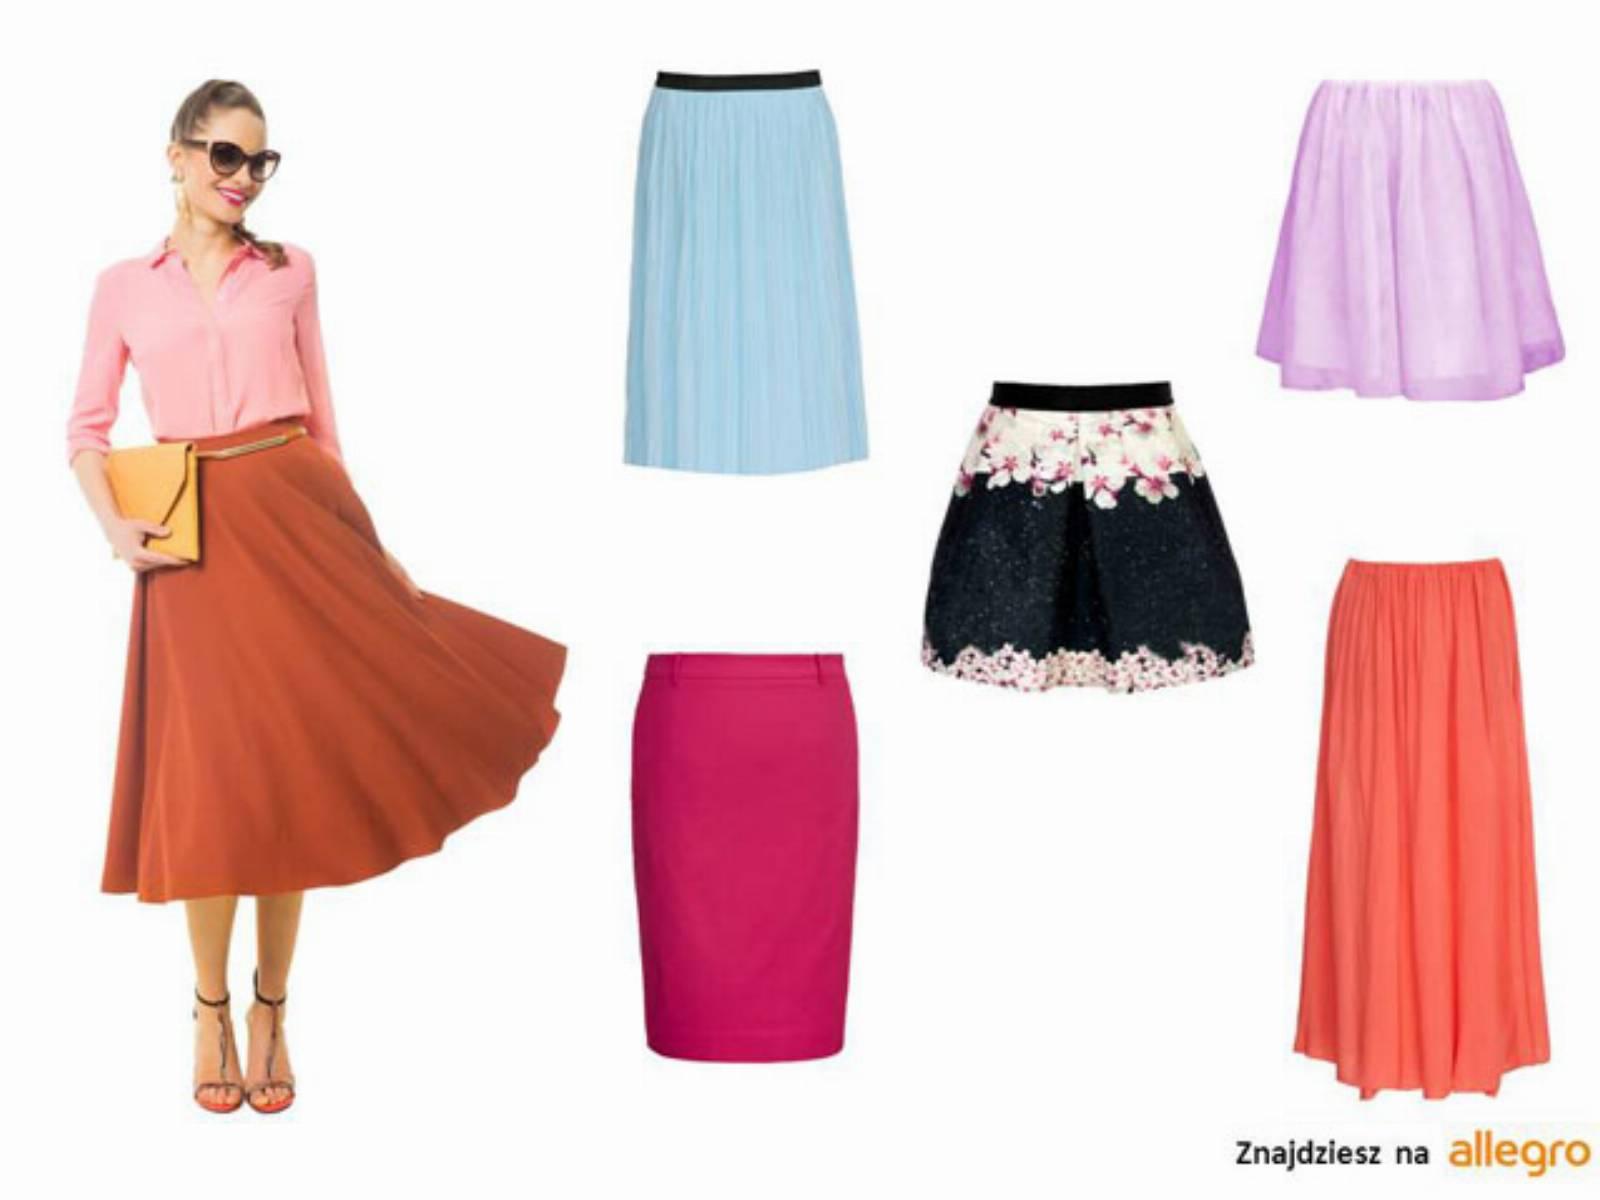 Mini, midi, maxi: modne spódnice na lato 2014 przegląd